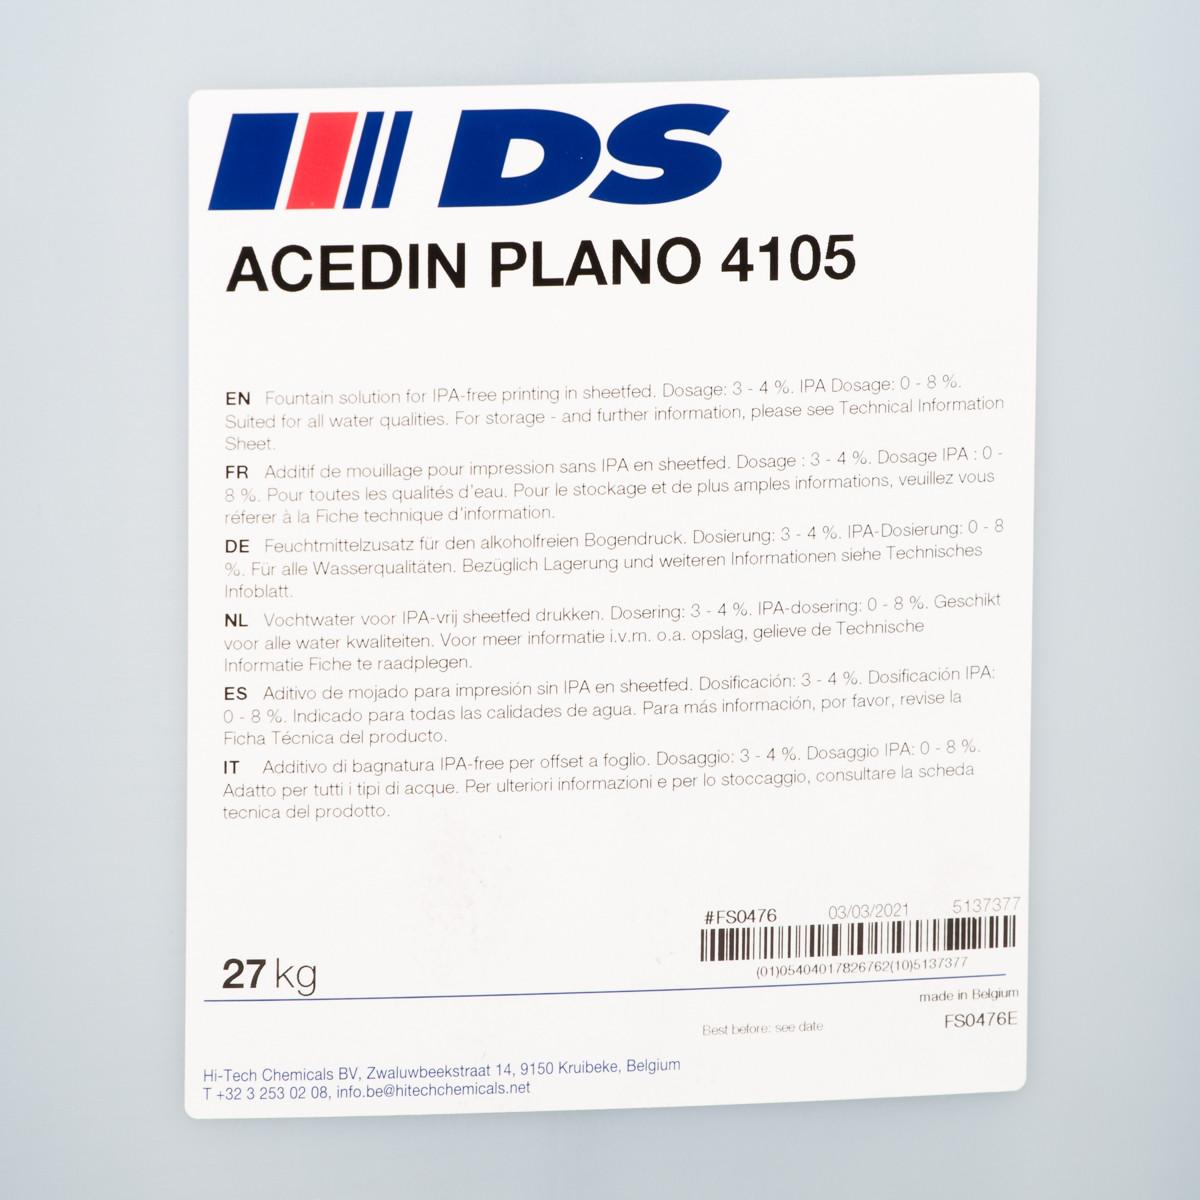 ACEDIN PLANO 4105 27 kg